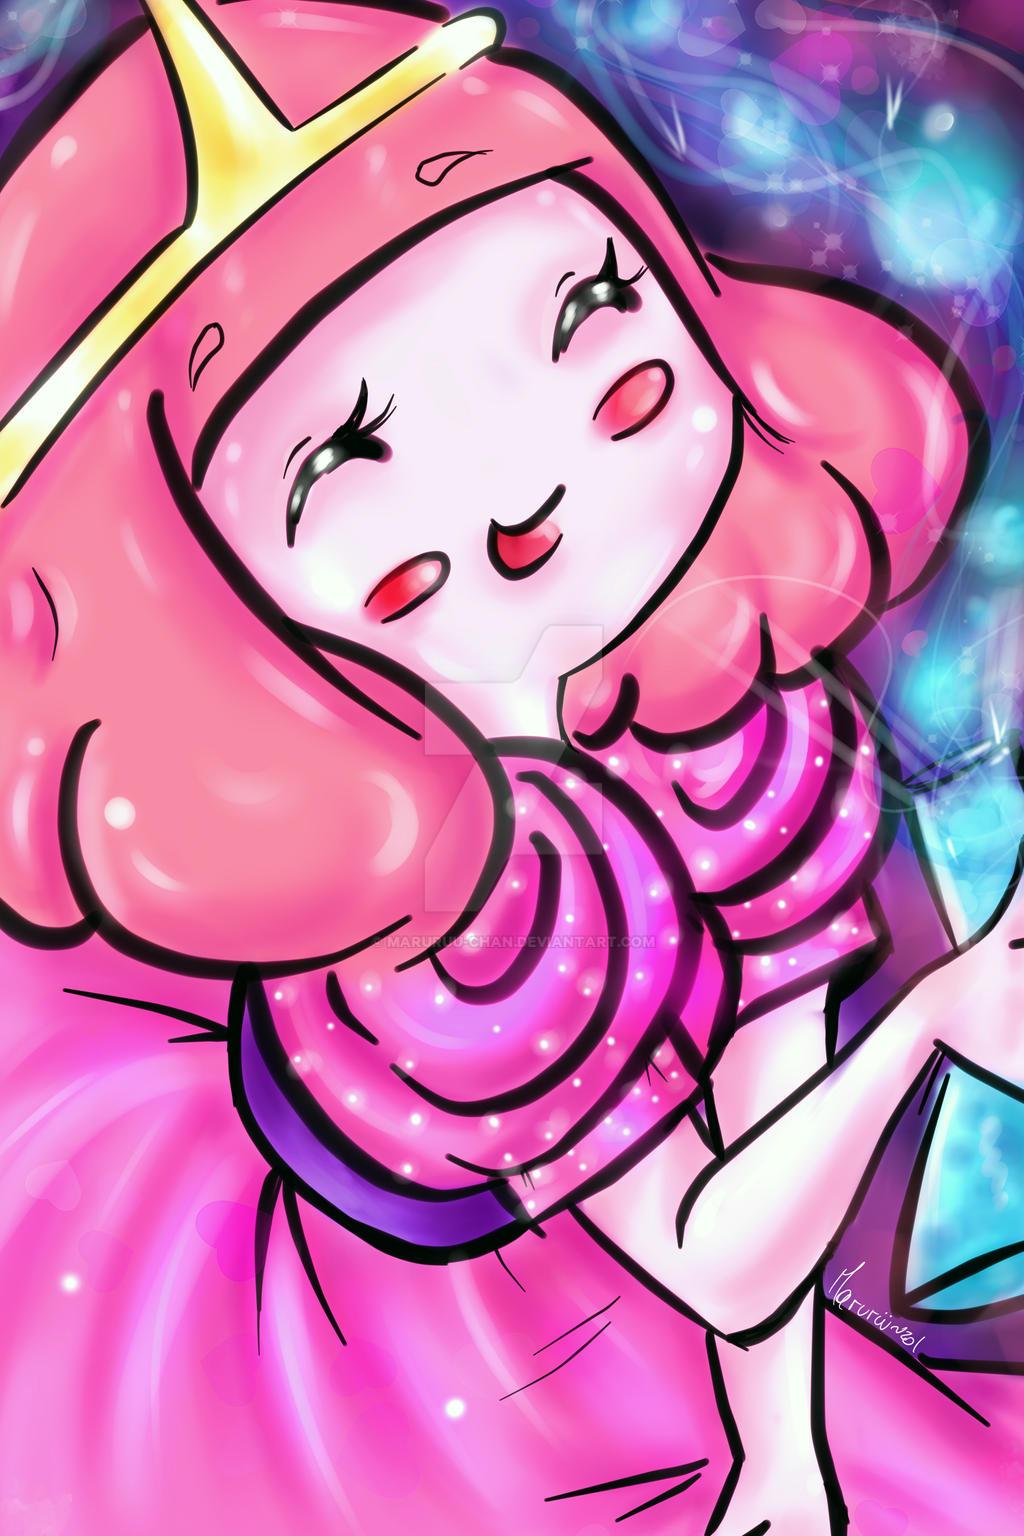 Dibujos en anime de hora de aventura get yasabe dulce princesa hora de aventura by maruruu chan altavistaventures Image collections